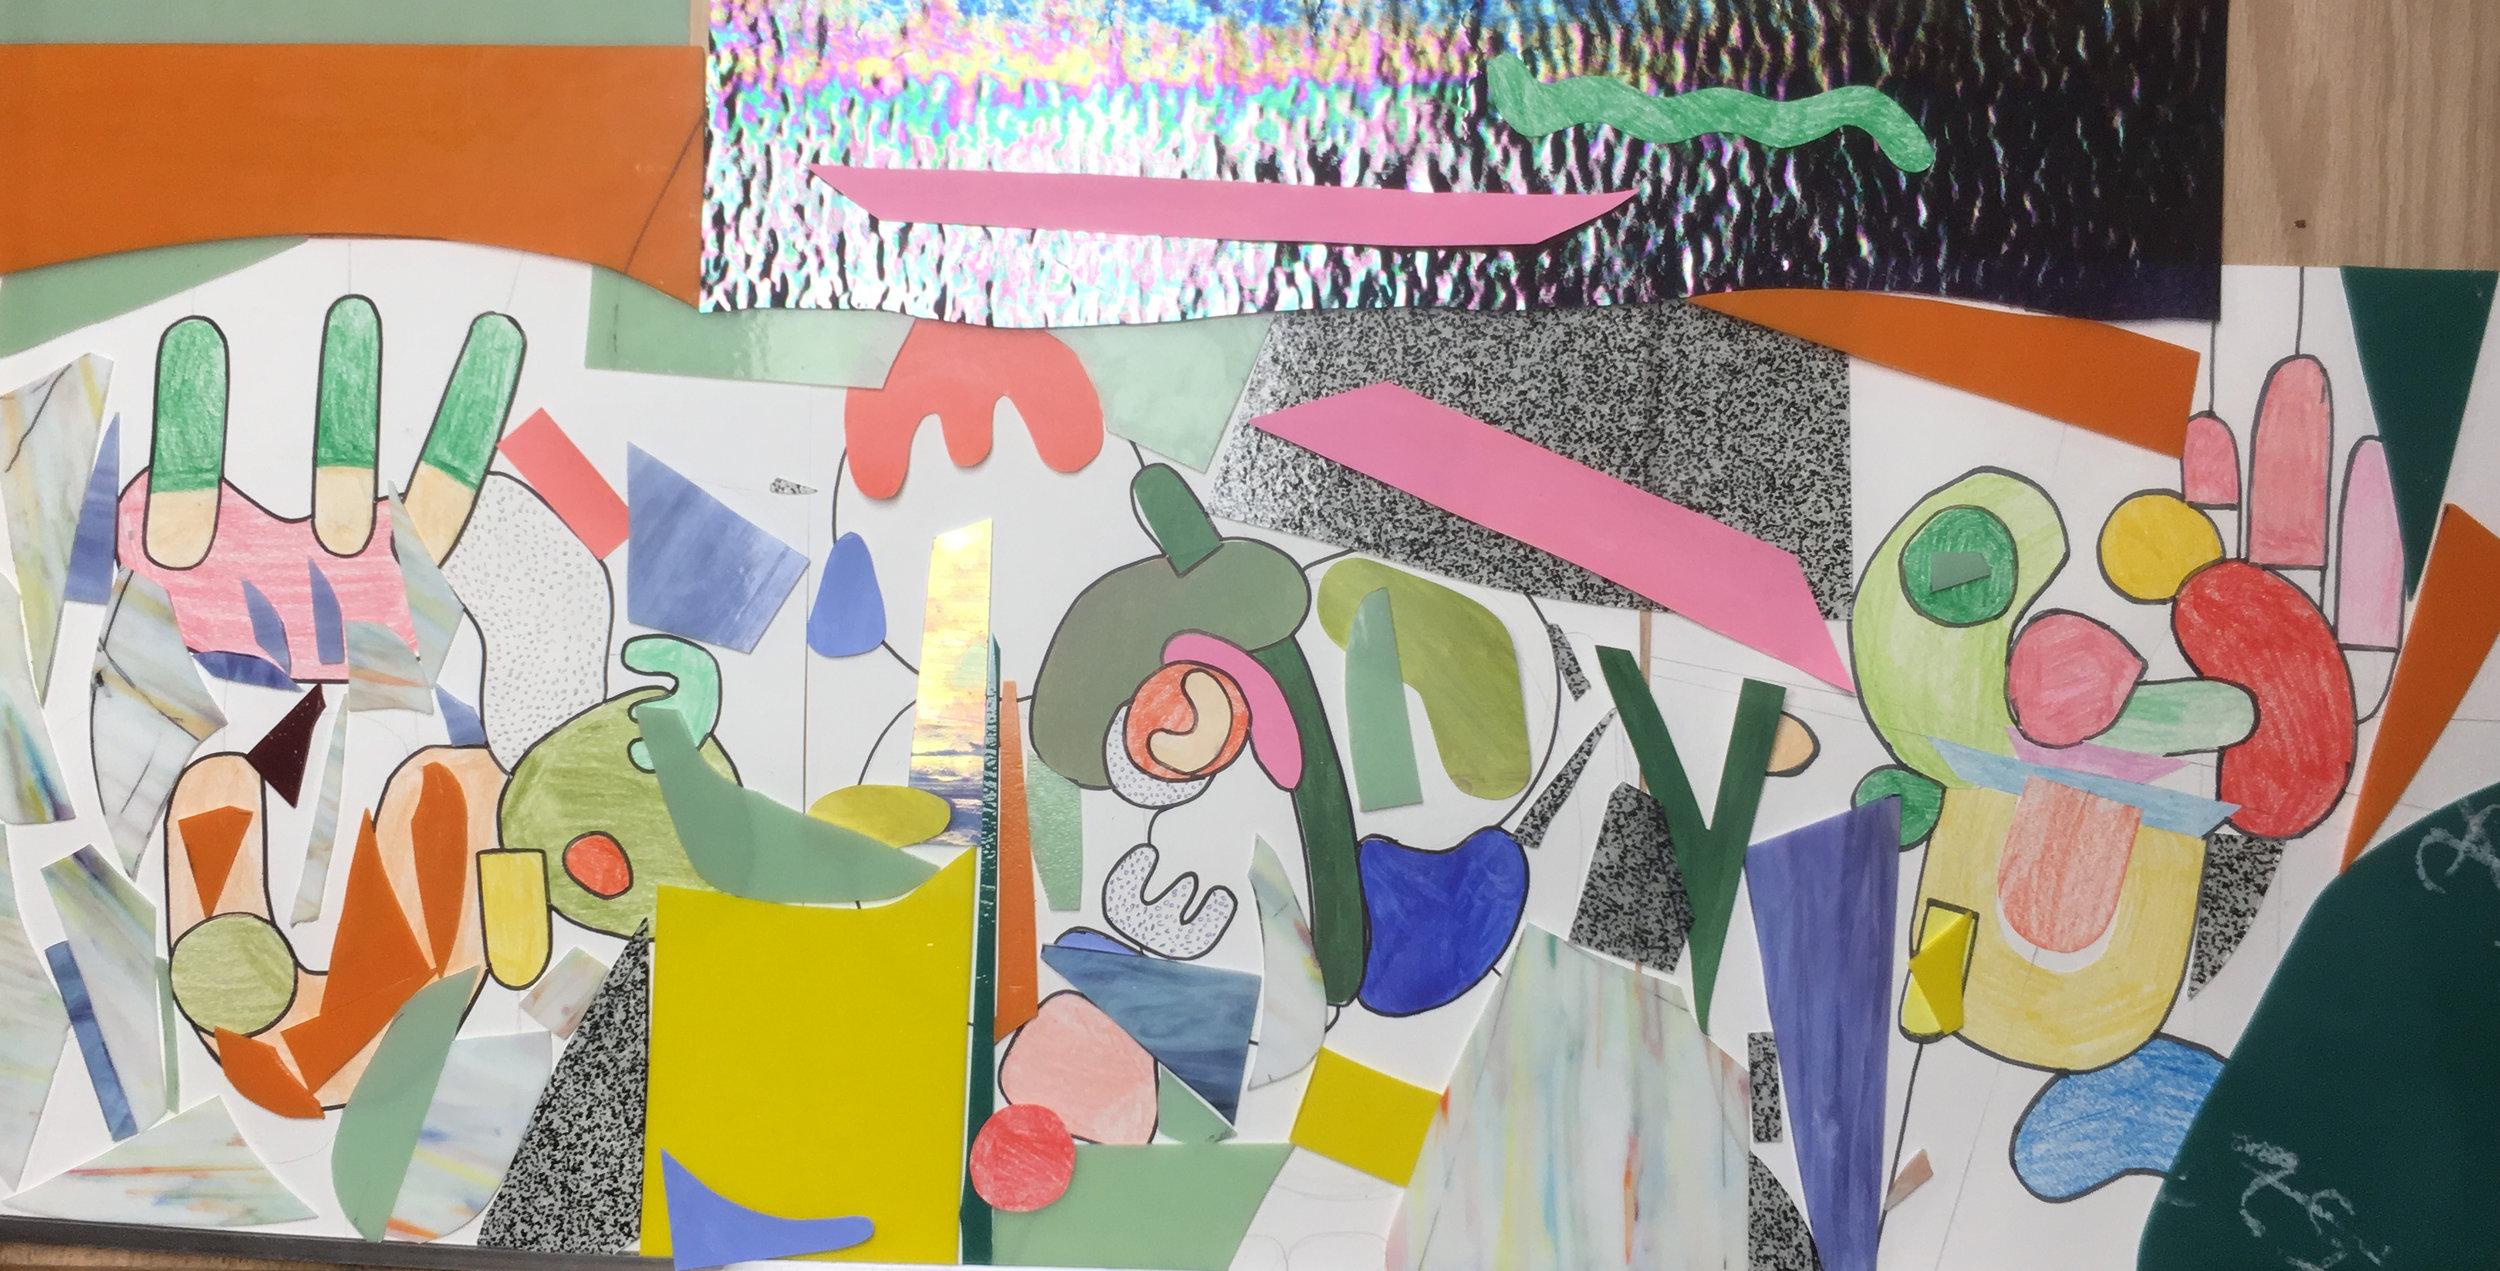 Stained-glass-collage-sketch-kerbi-urbanowski.jpg